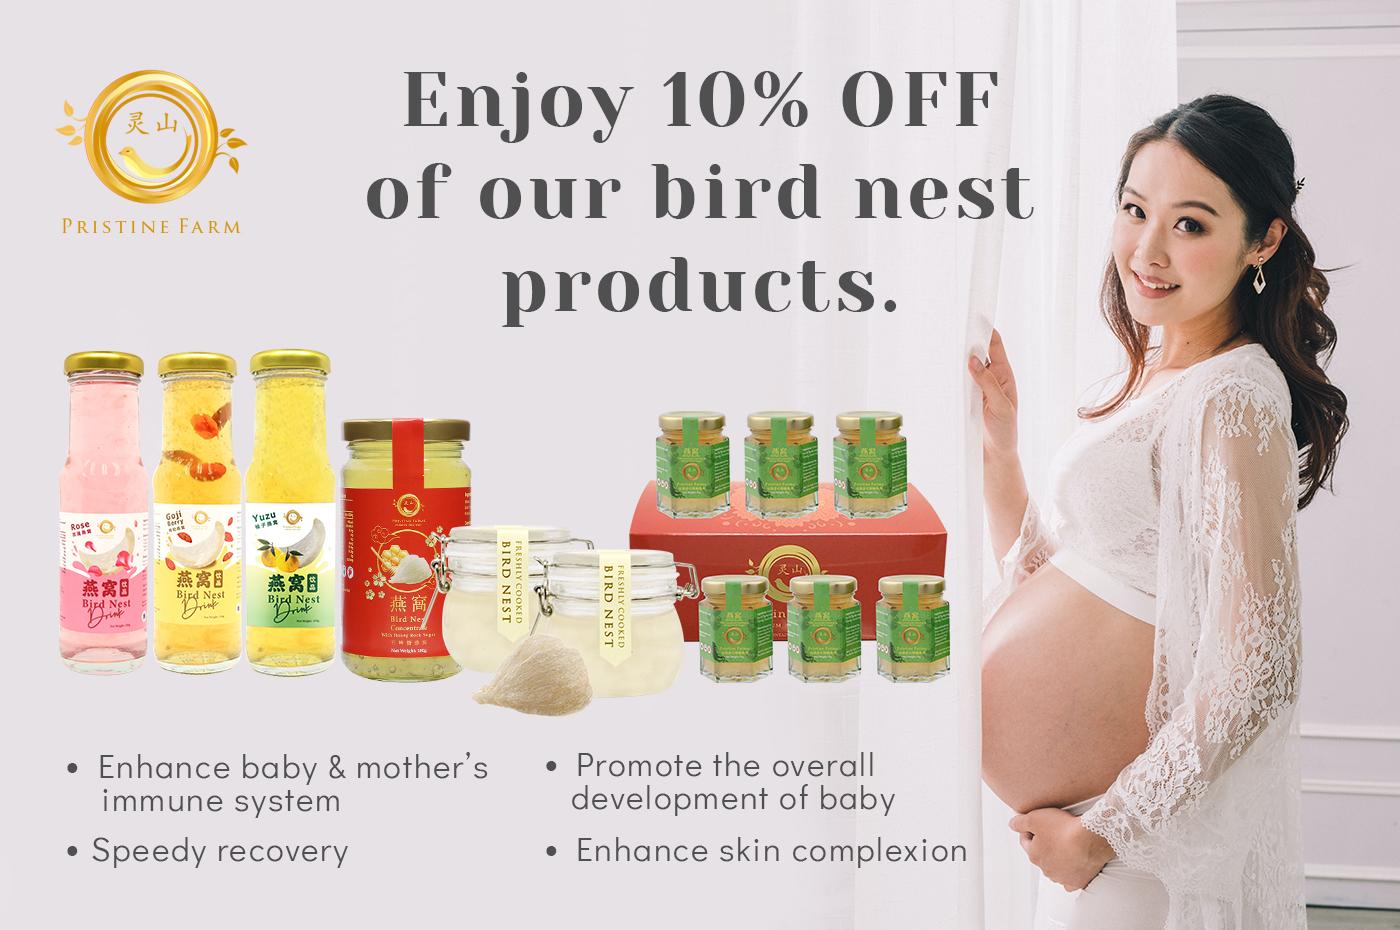 Enjoy 10% OFF Pristine Farm Bird Nest.